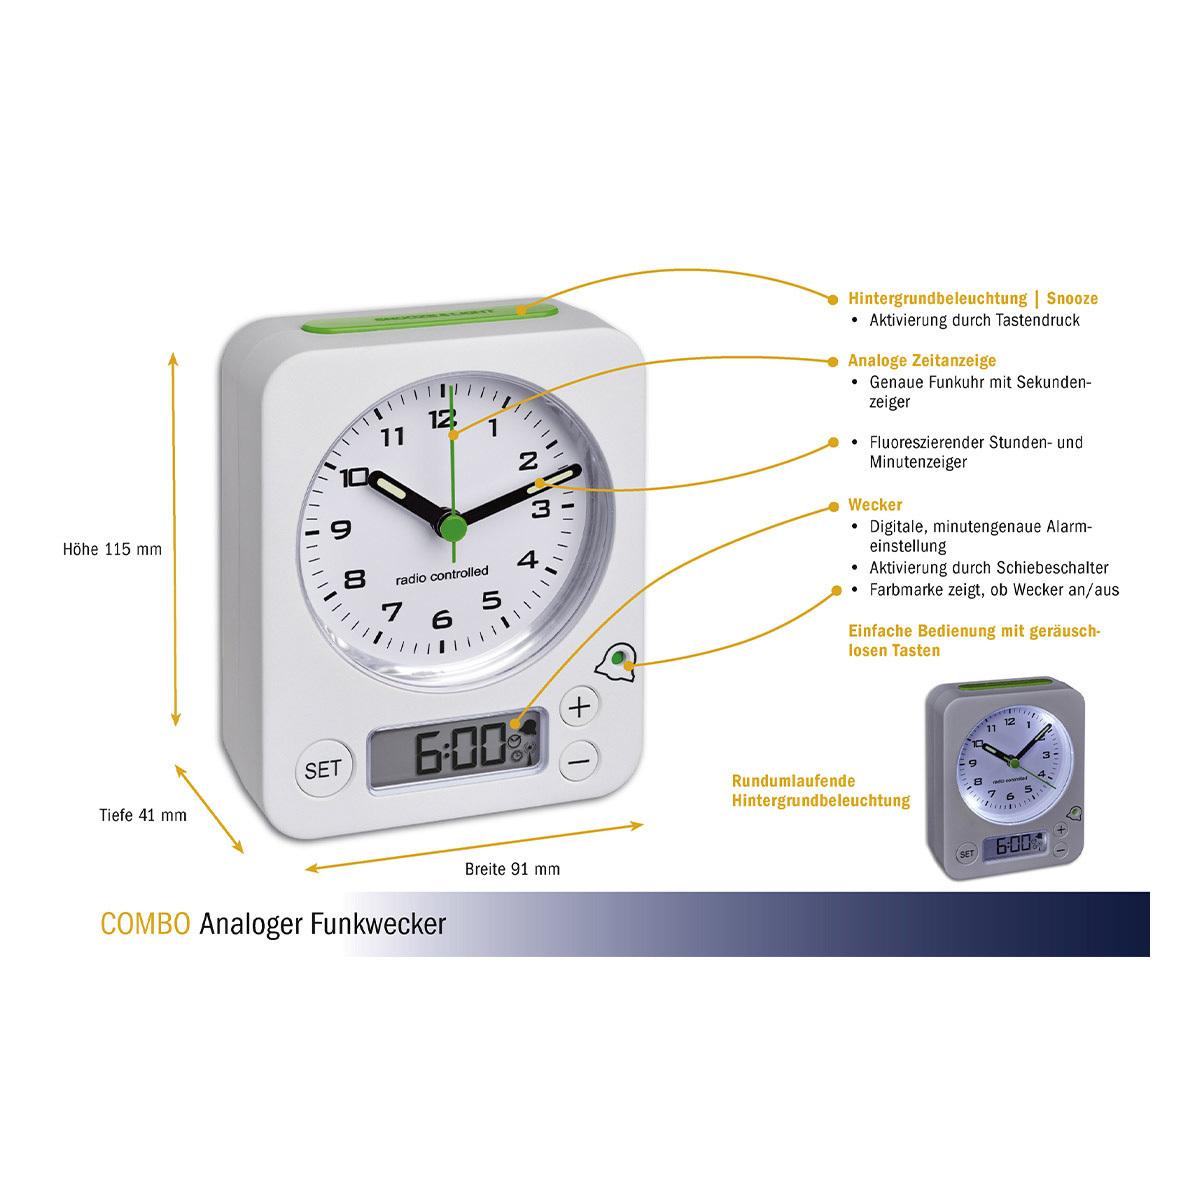 60-1511-02-04-analoger-funk-wecker-combo-abmessungen-1200x1200px.jpg